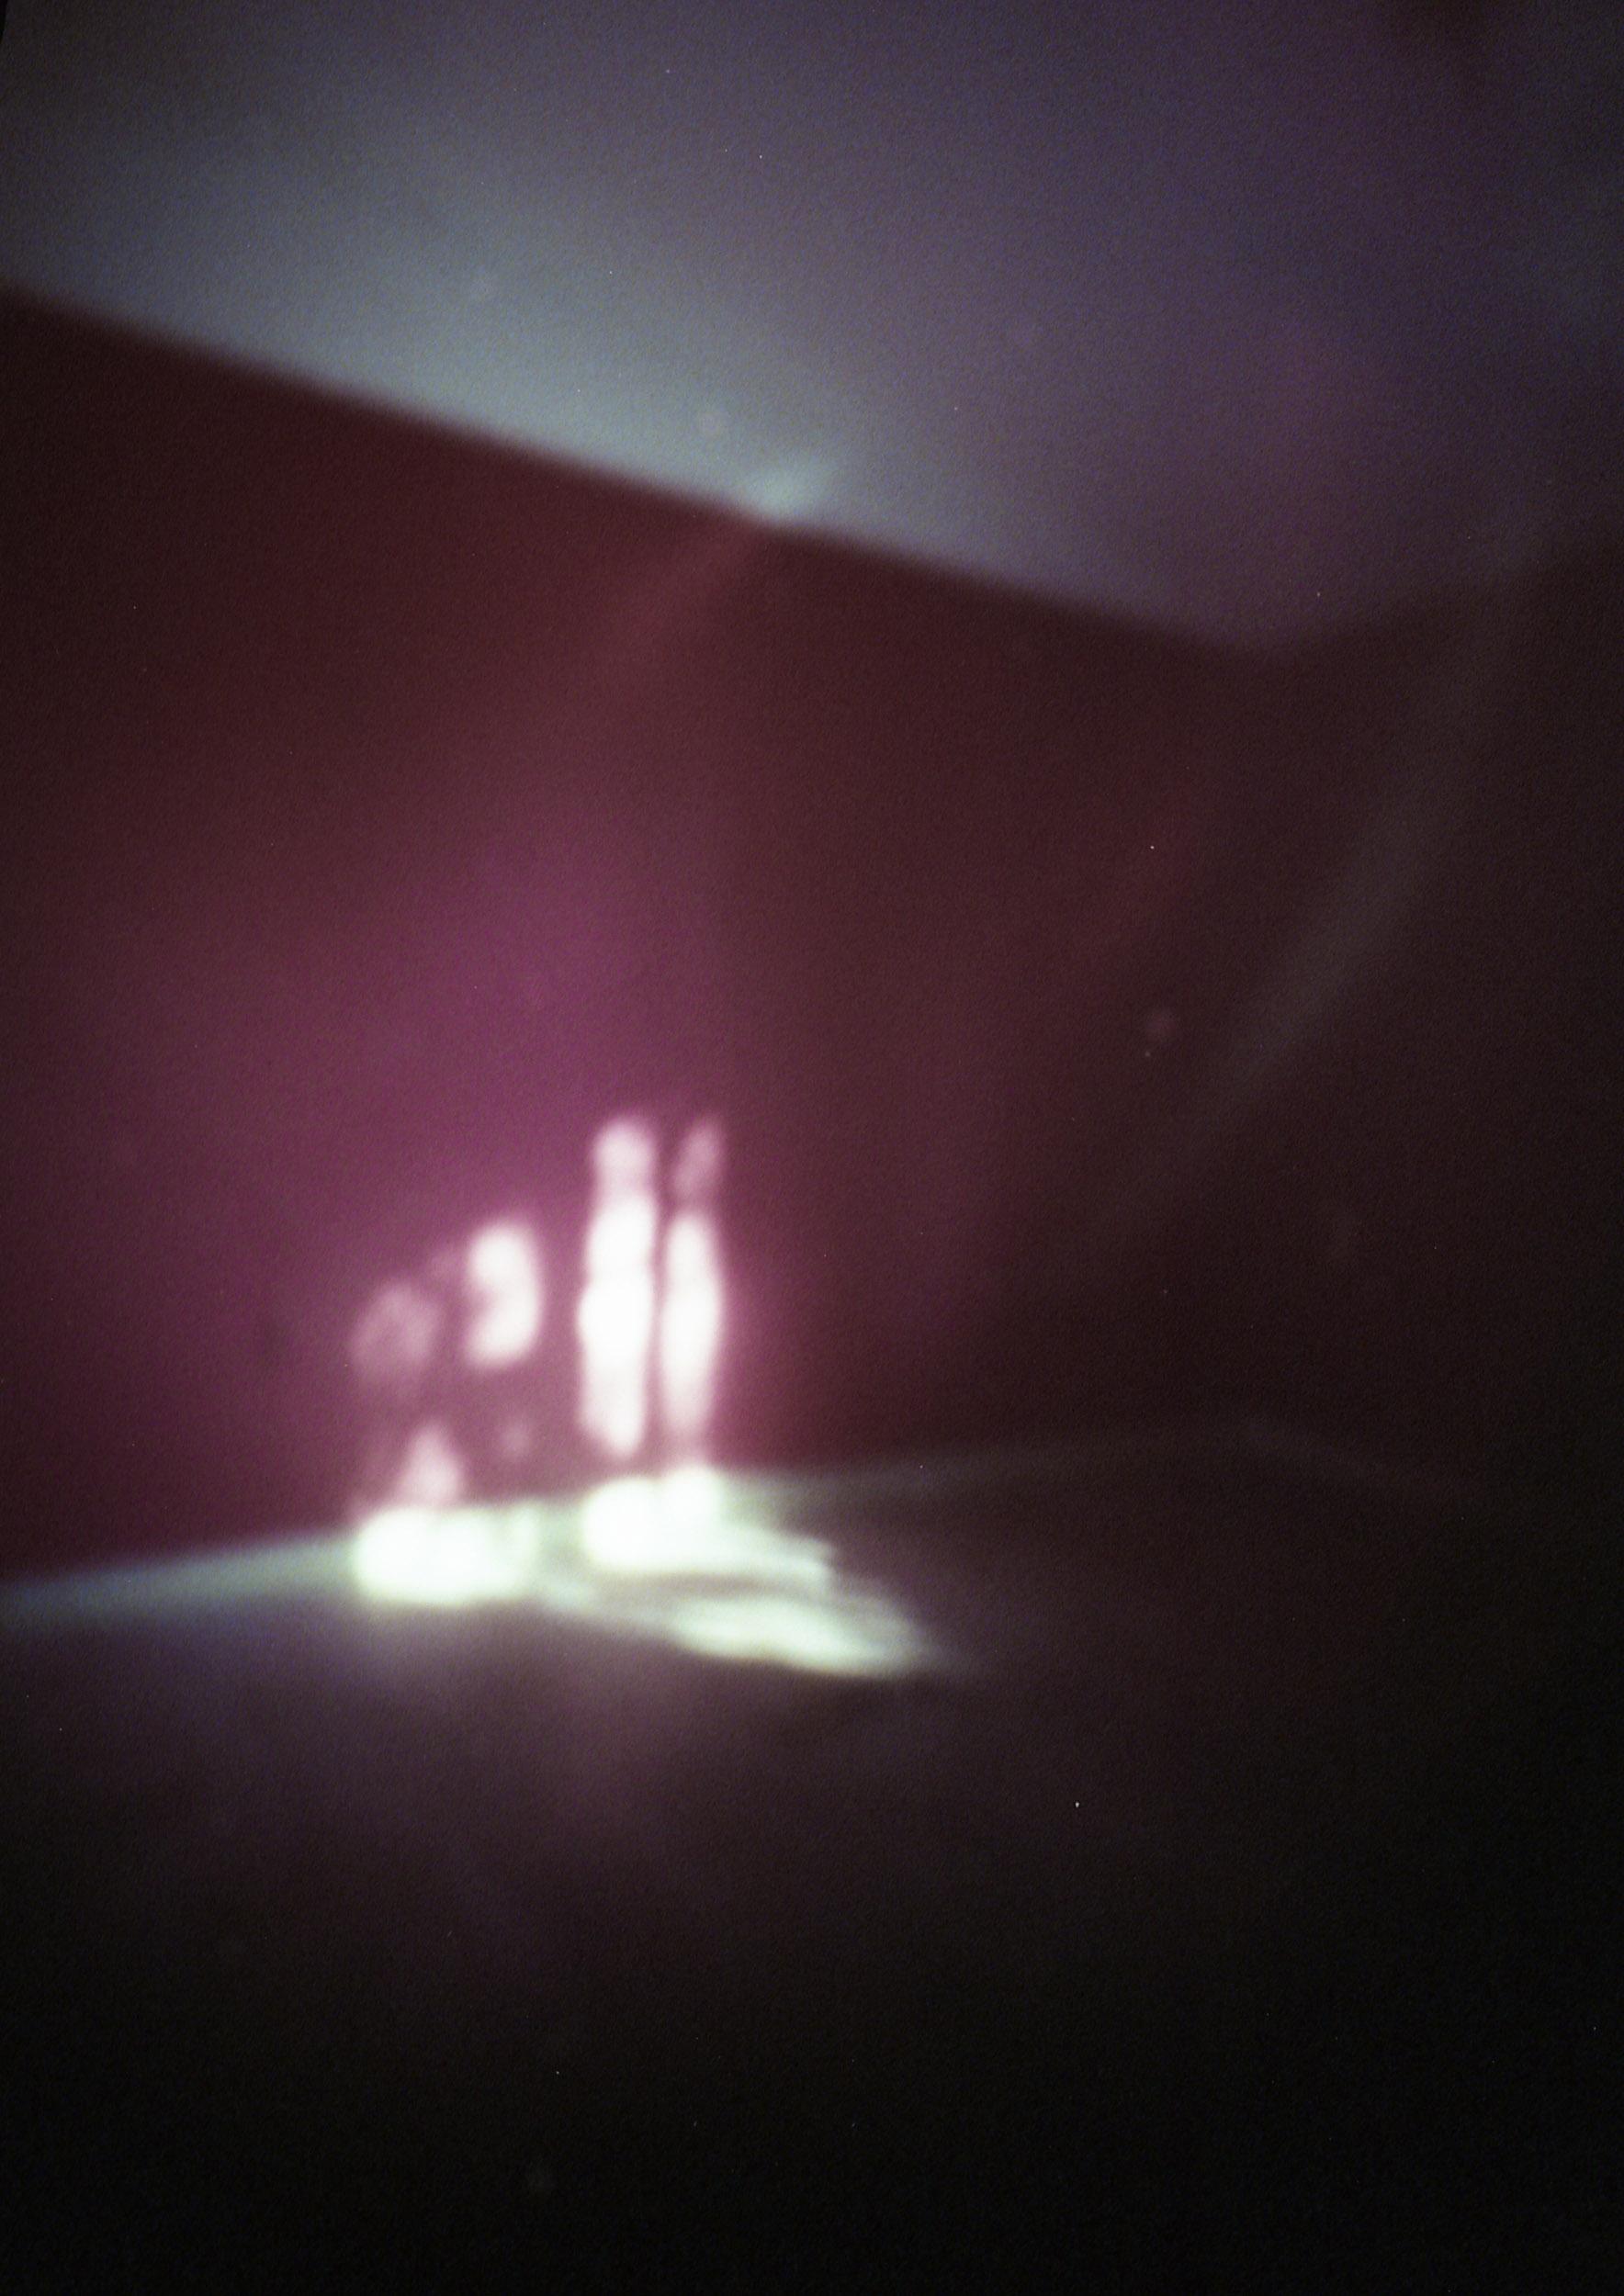 fotoskolen fatamorgana_Clea 06.jpg